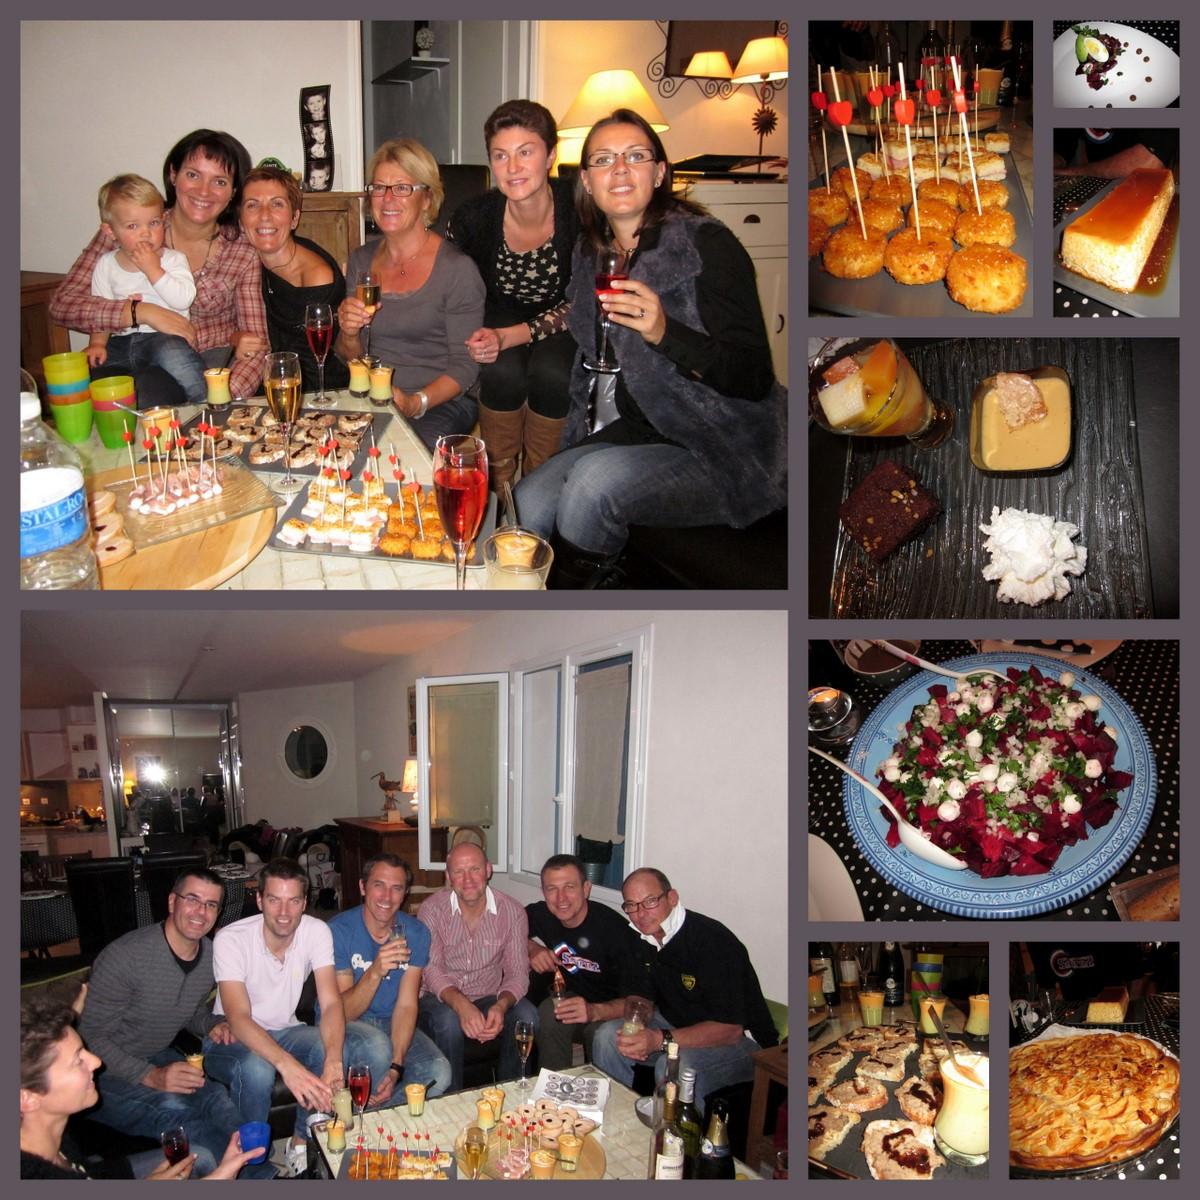 Grand week-end à La Rochelle...